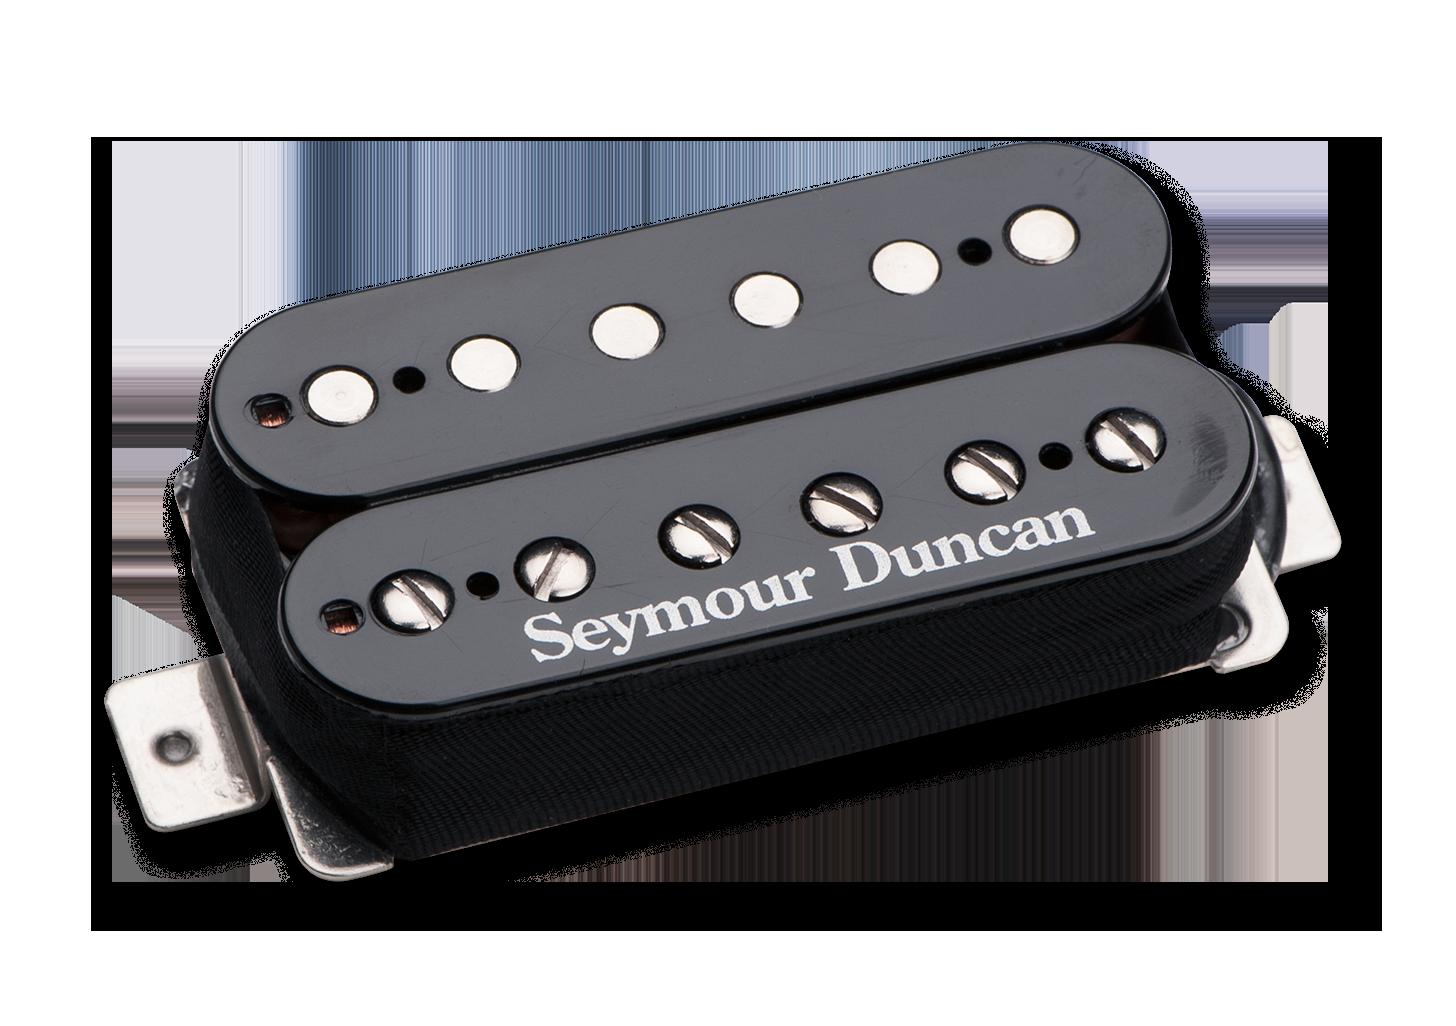 Seymour Duncan Blackouts Coil Pack AHB-10B Bridge Black